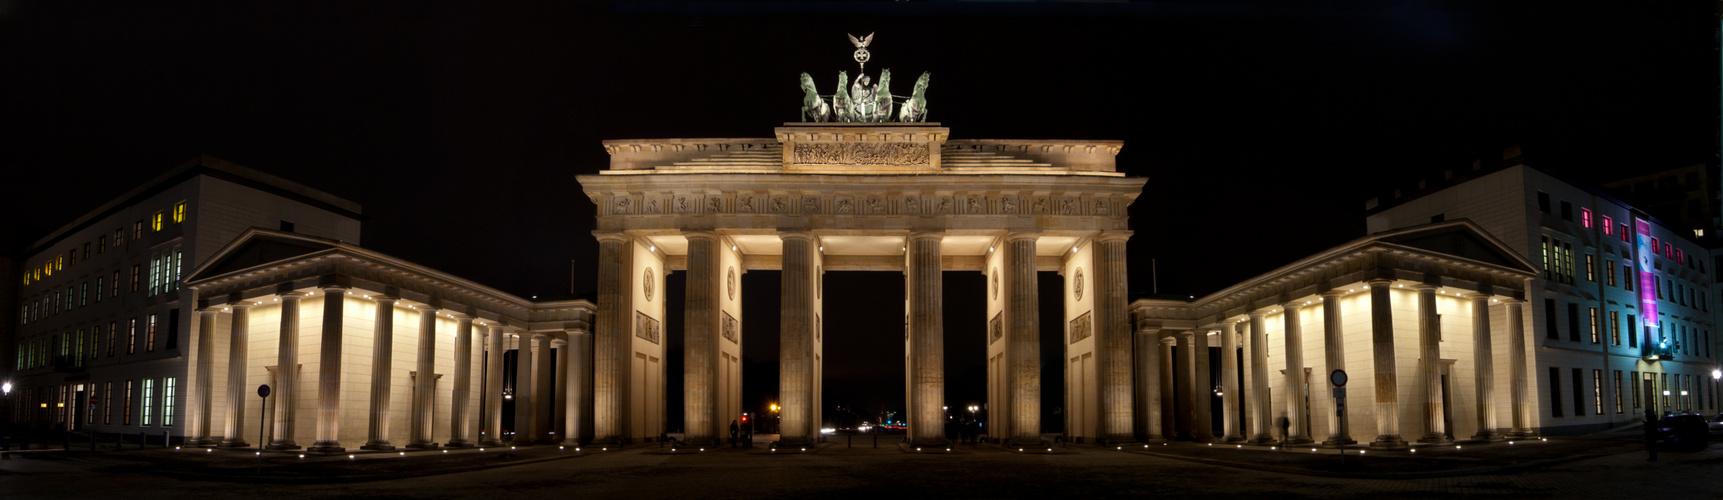 - Brandenburger Tor -